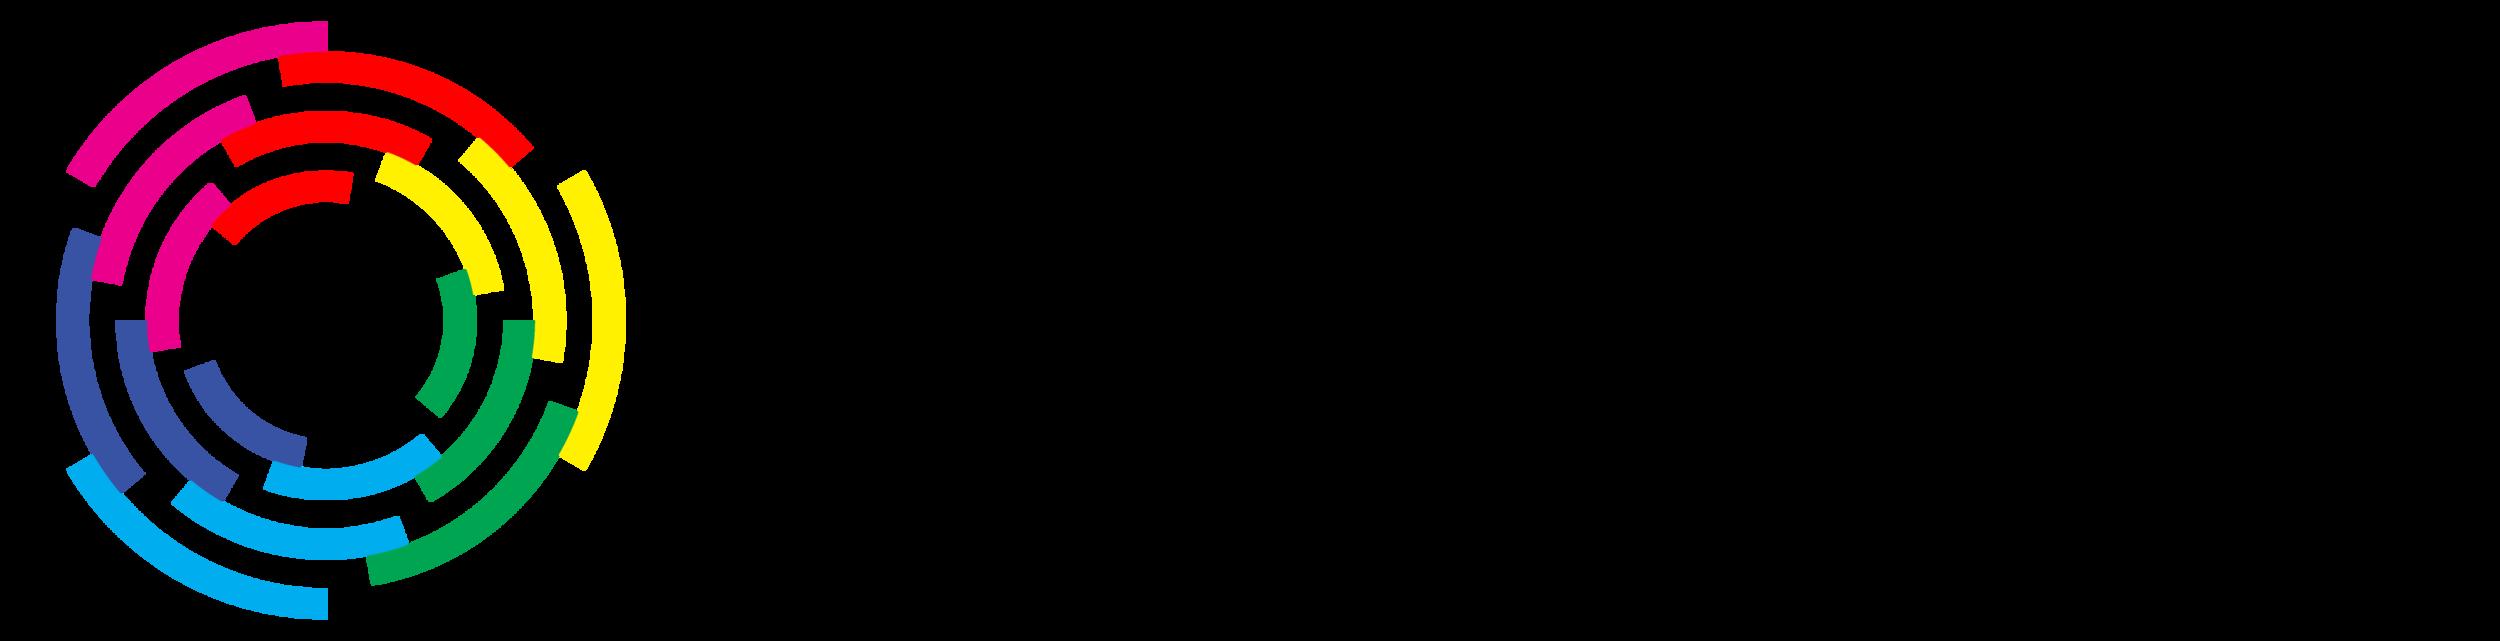 DBDesign.png